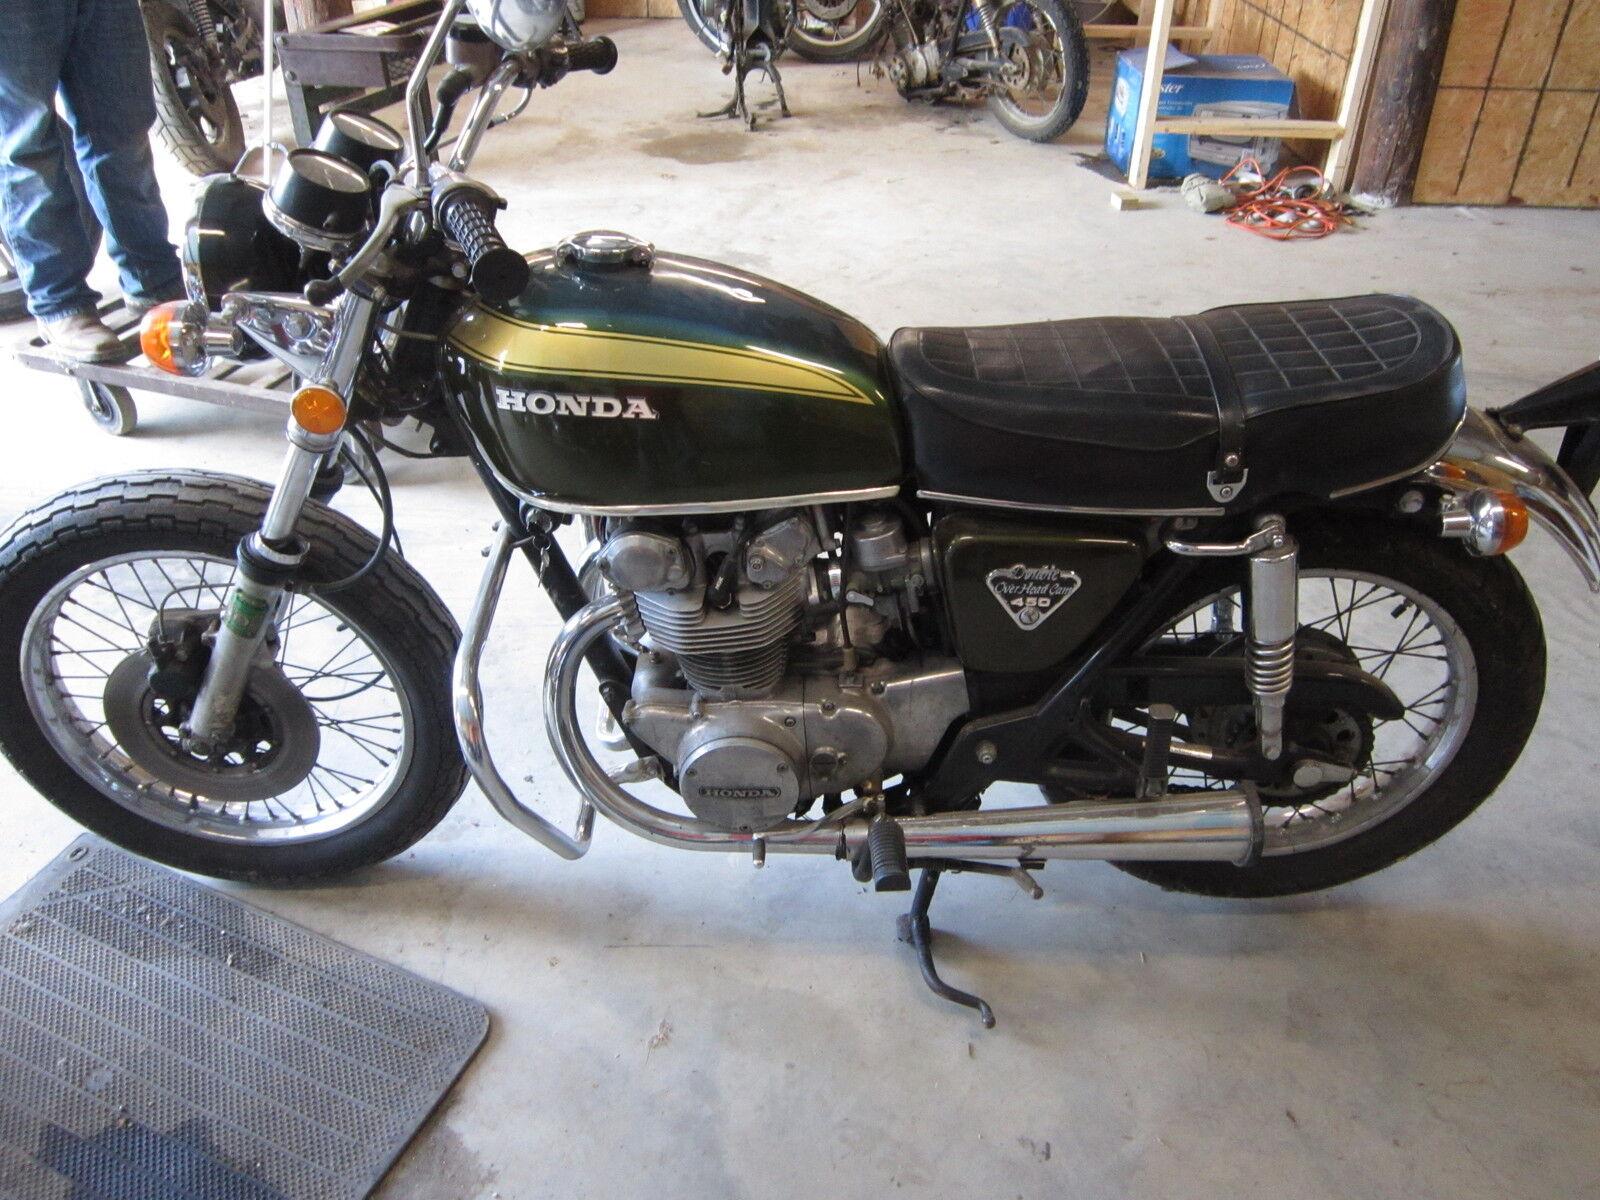 NPN Motorcycle Parts